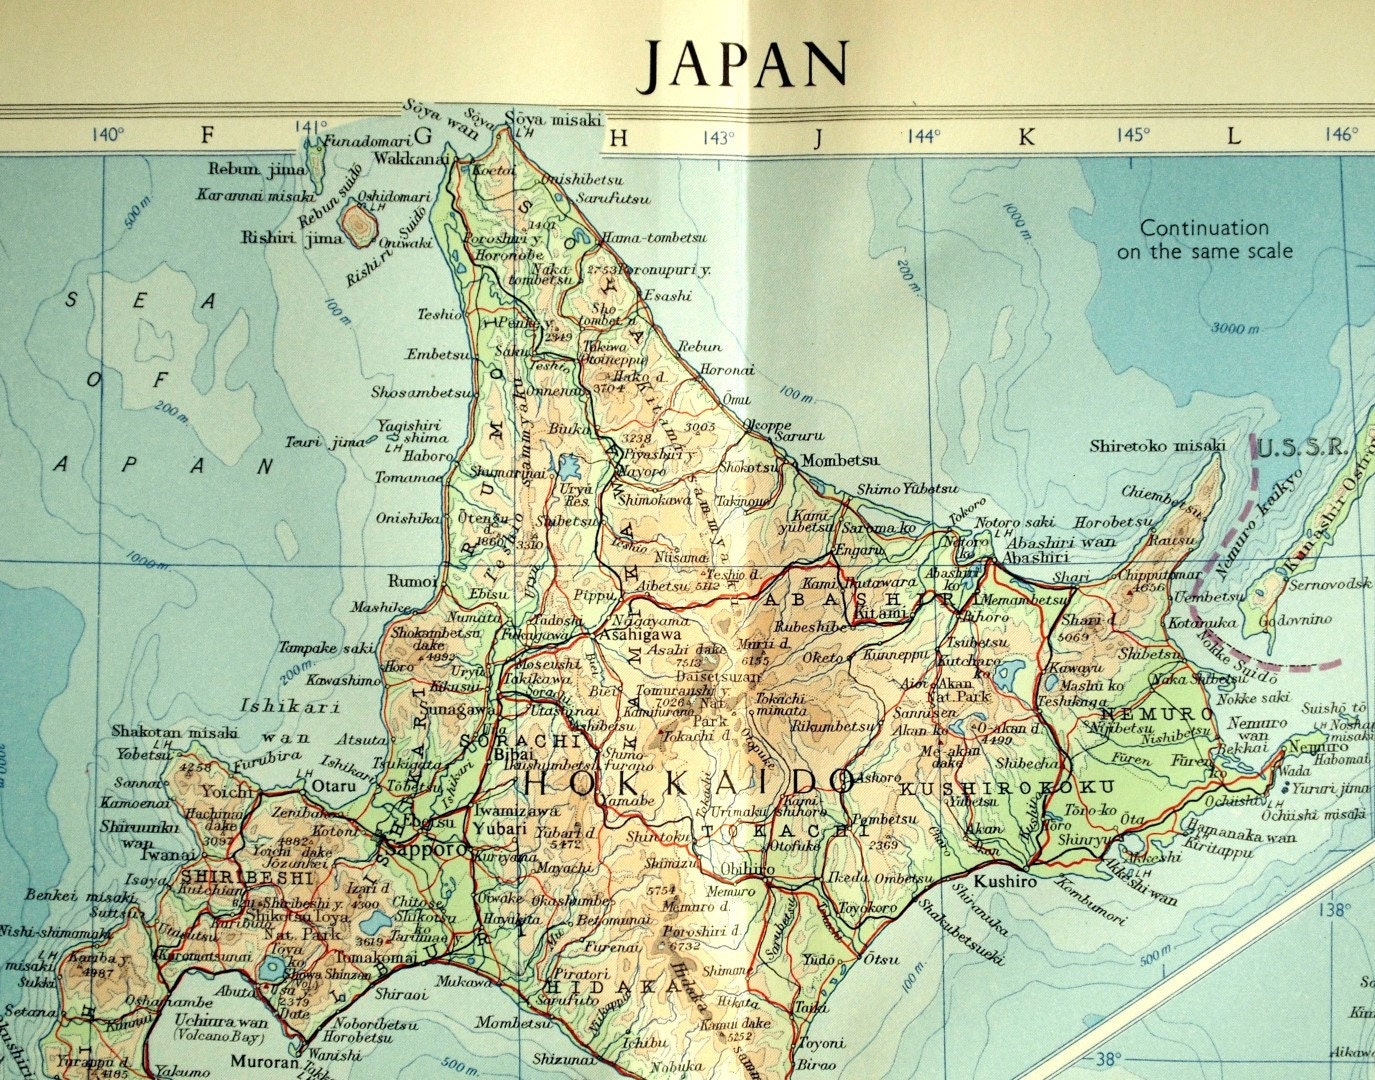 Vintage Map Of Japan Japan Vintage Map Insets Of - Japan map full